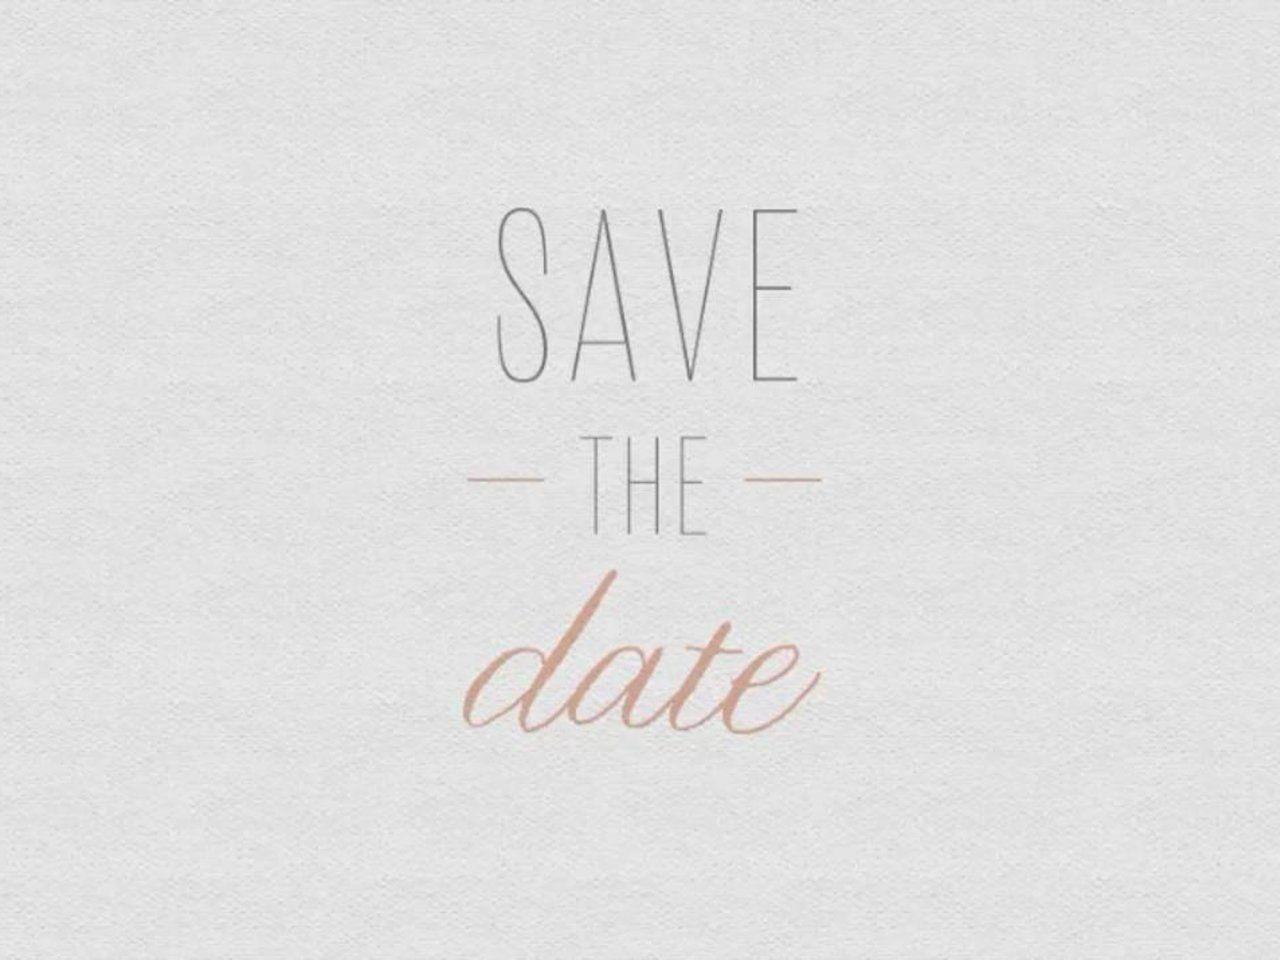 Save The Date Save The Date Video Save The Date Wedding Invitation Video